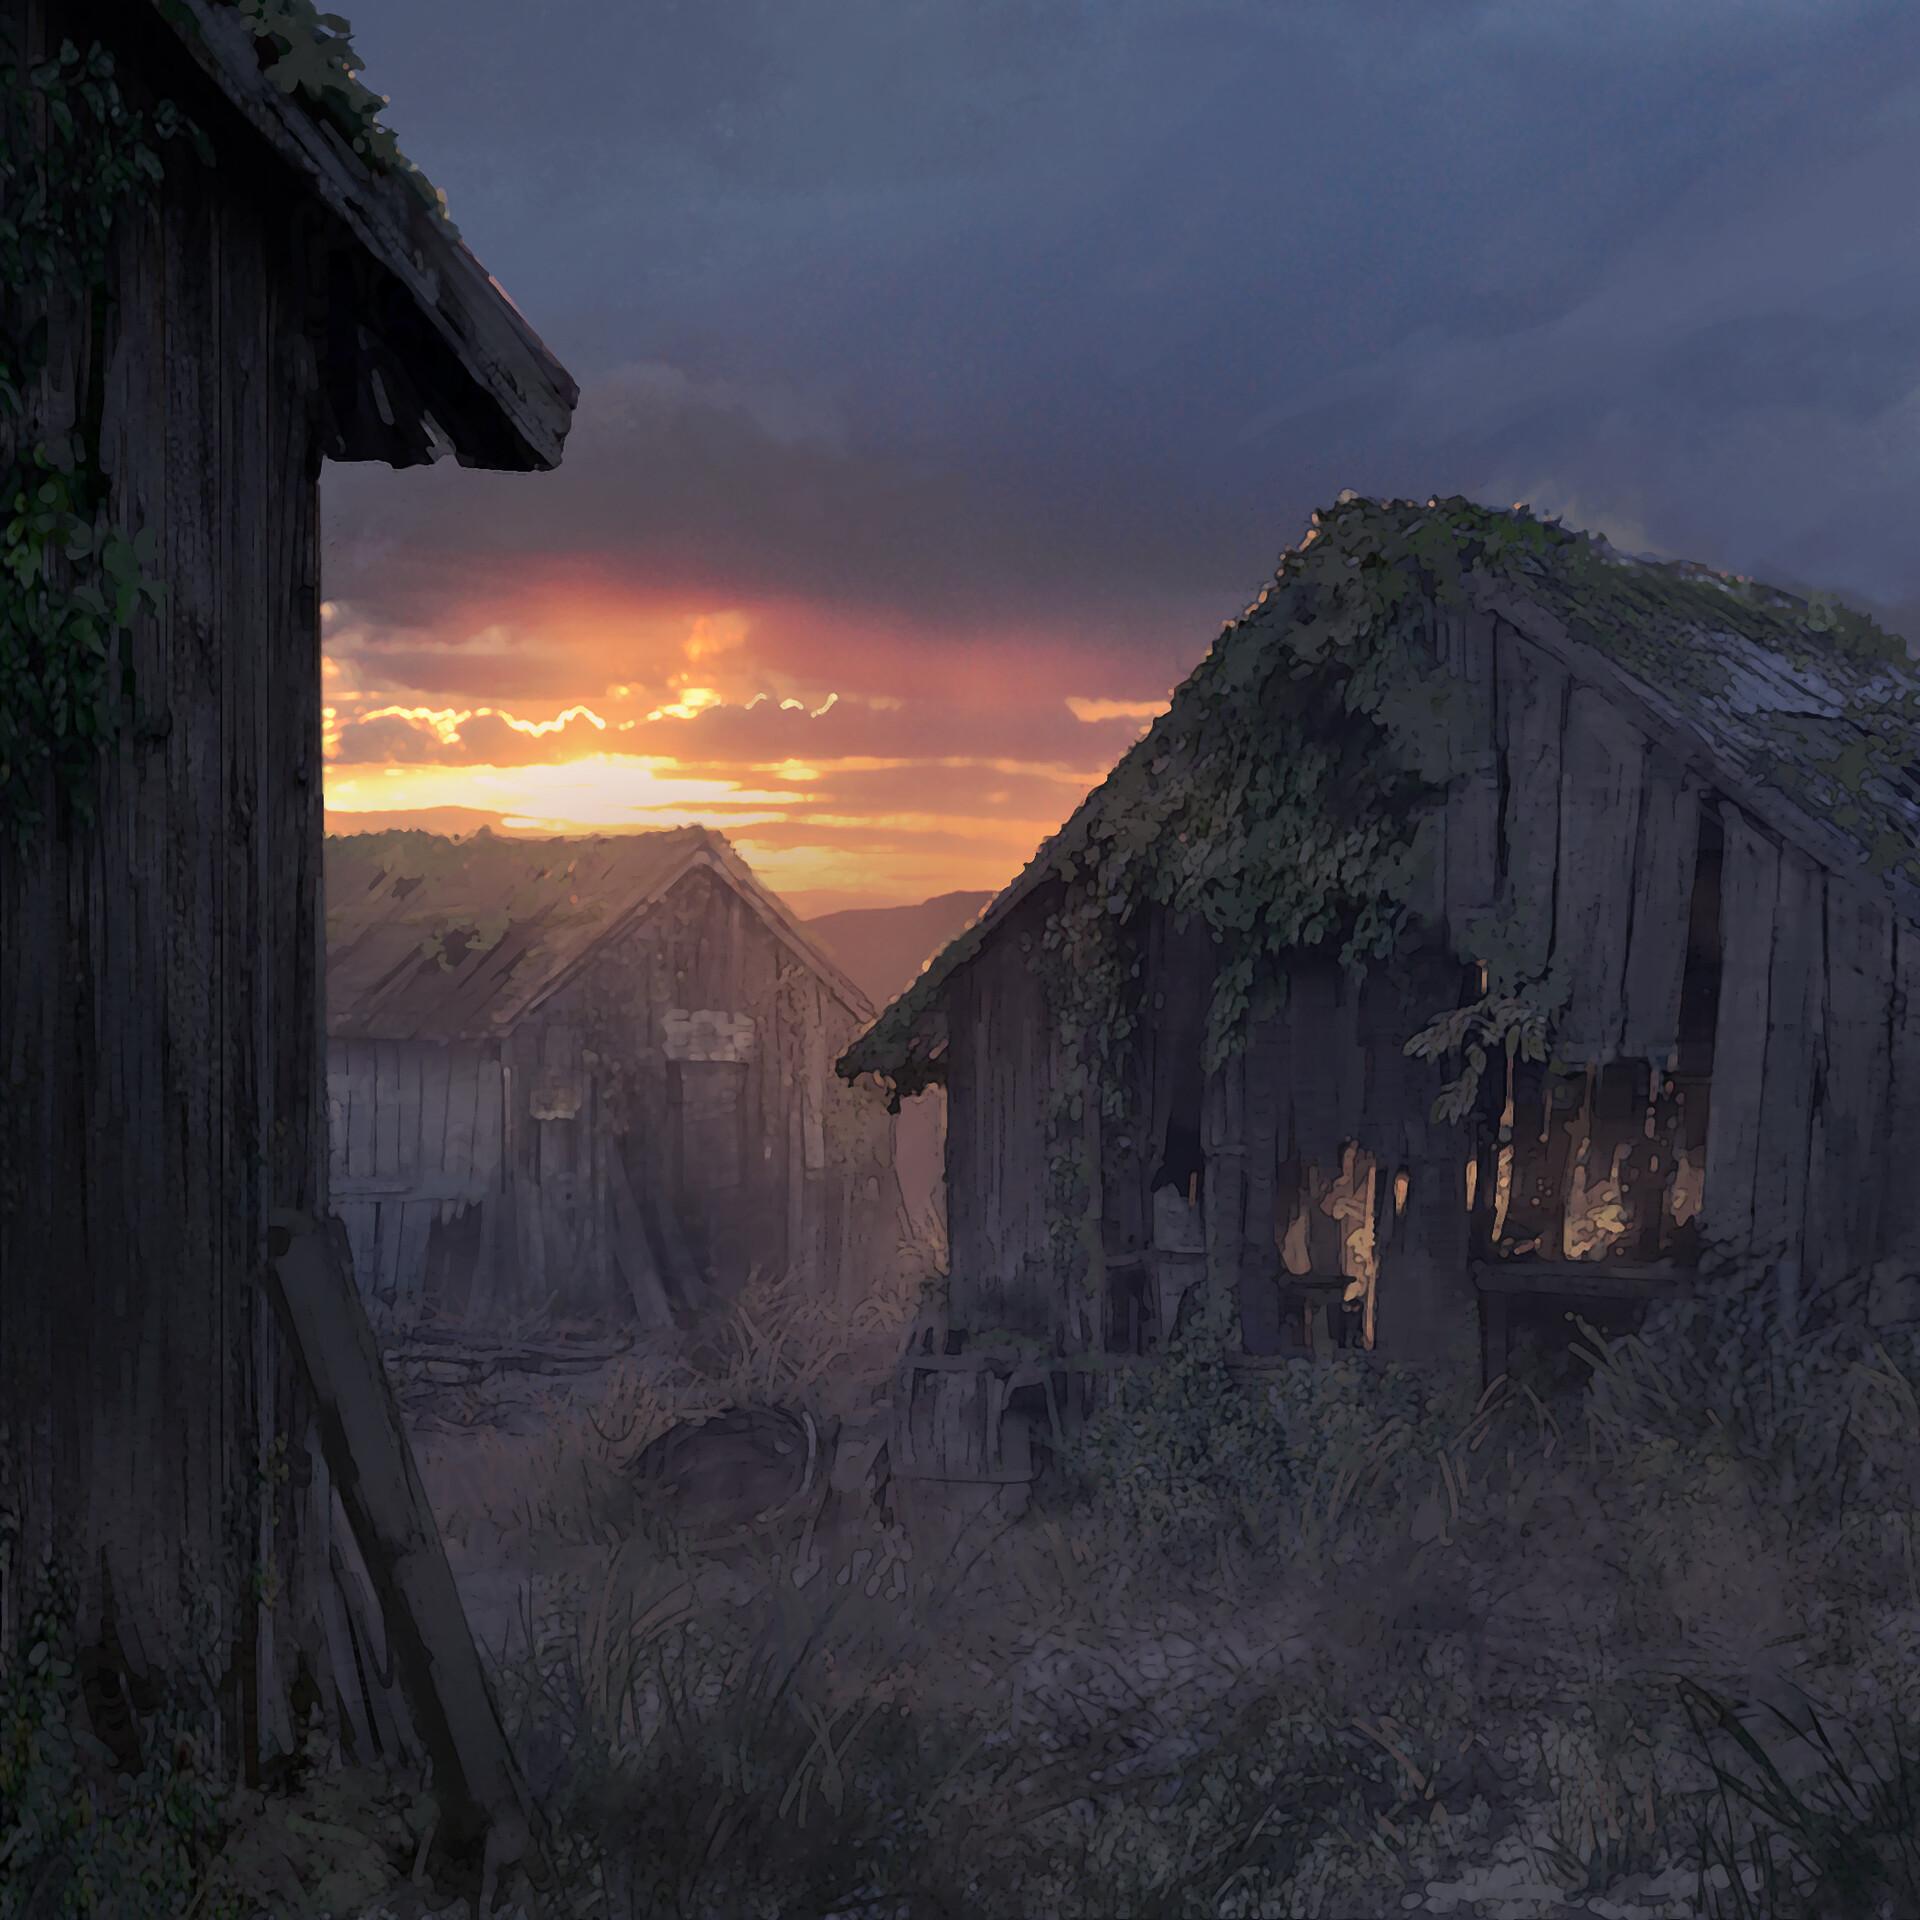 franklin-chan-pzo6040-abandoned-shacks-portfolio.jpg